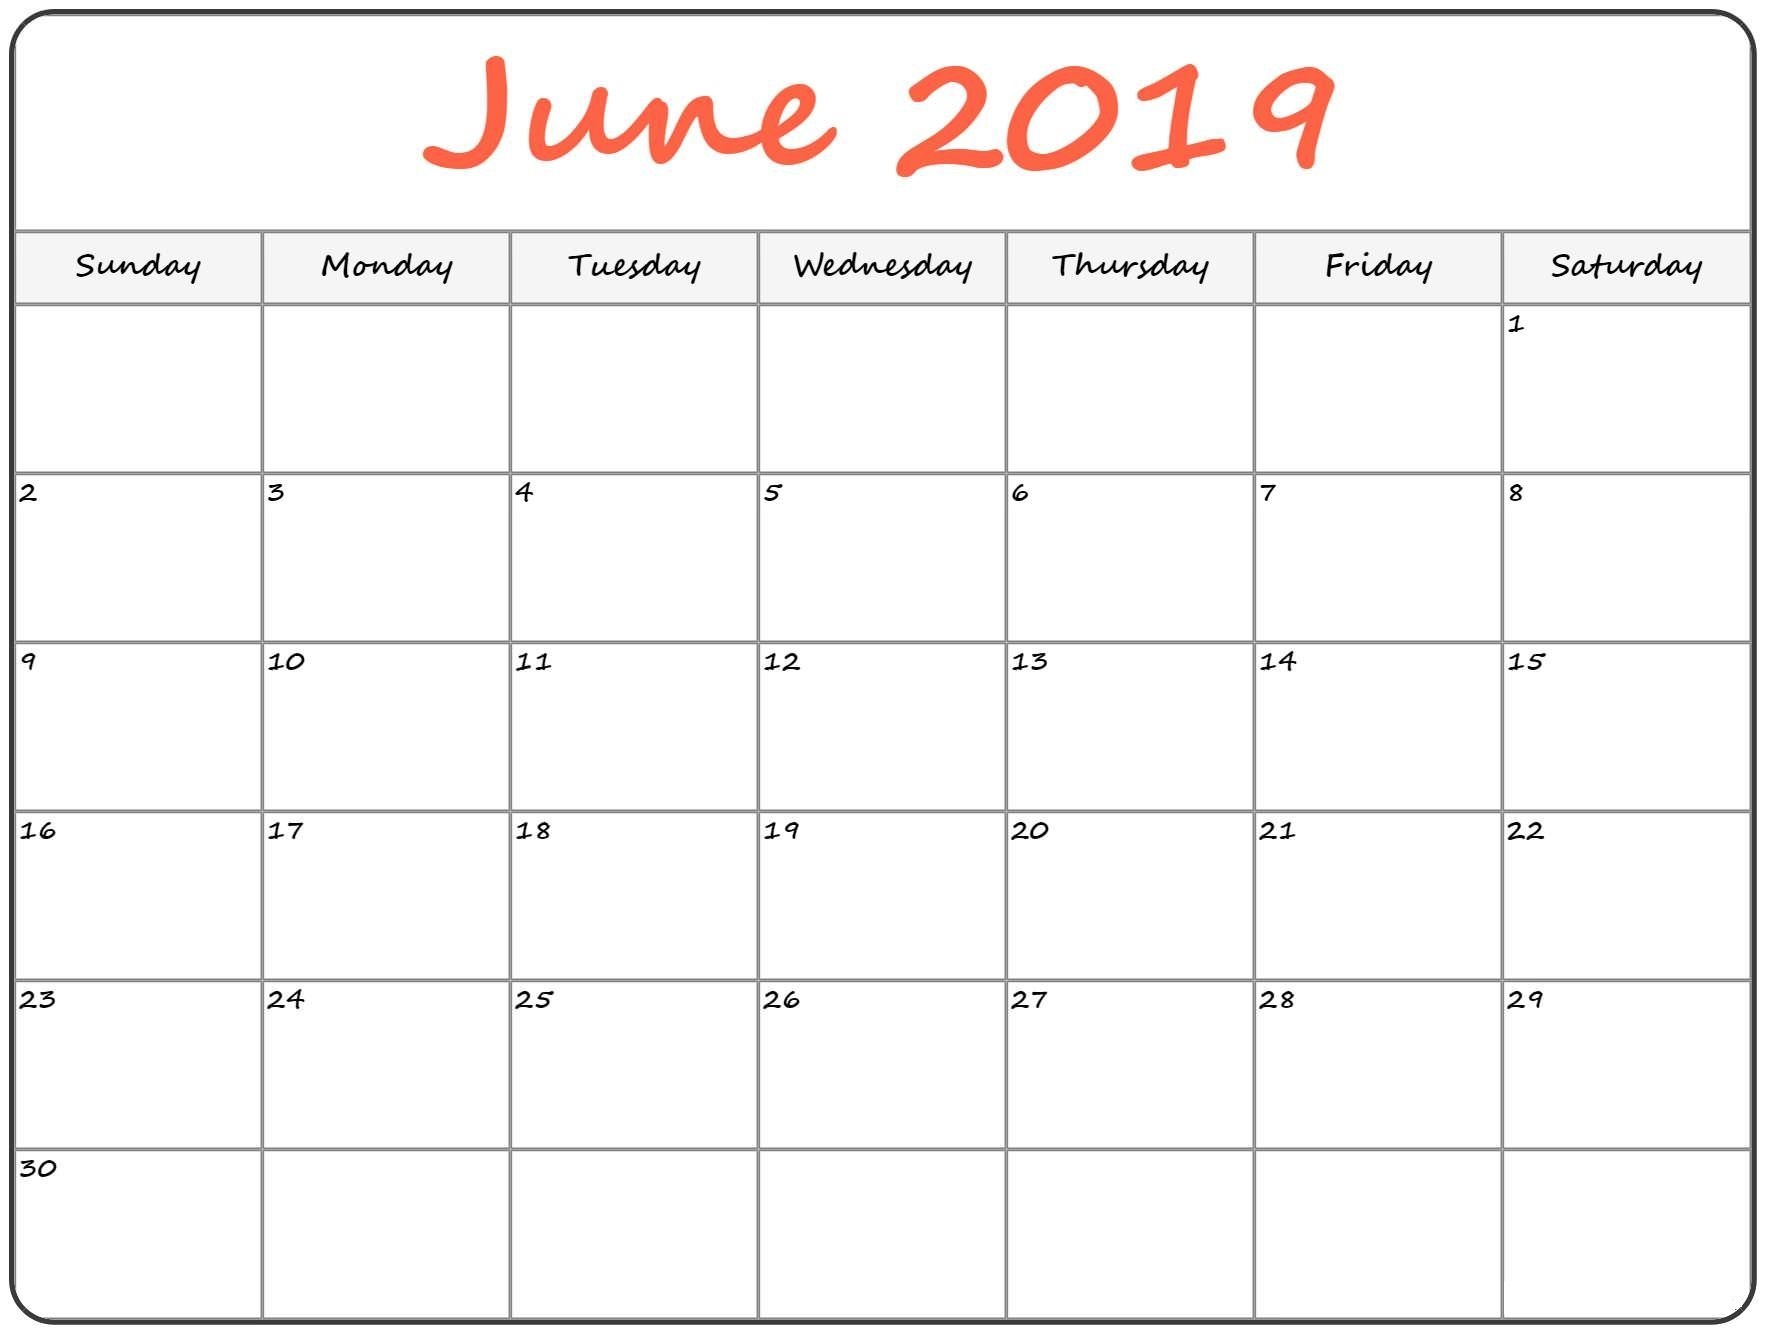 June 2019 Monthly Calendar Printable